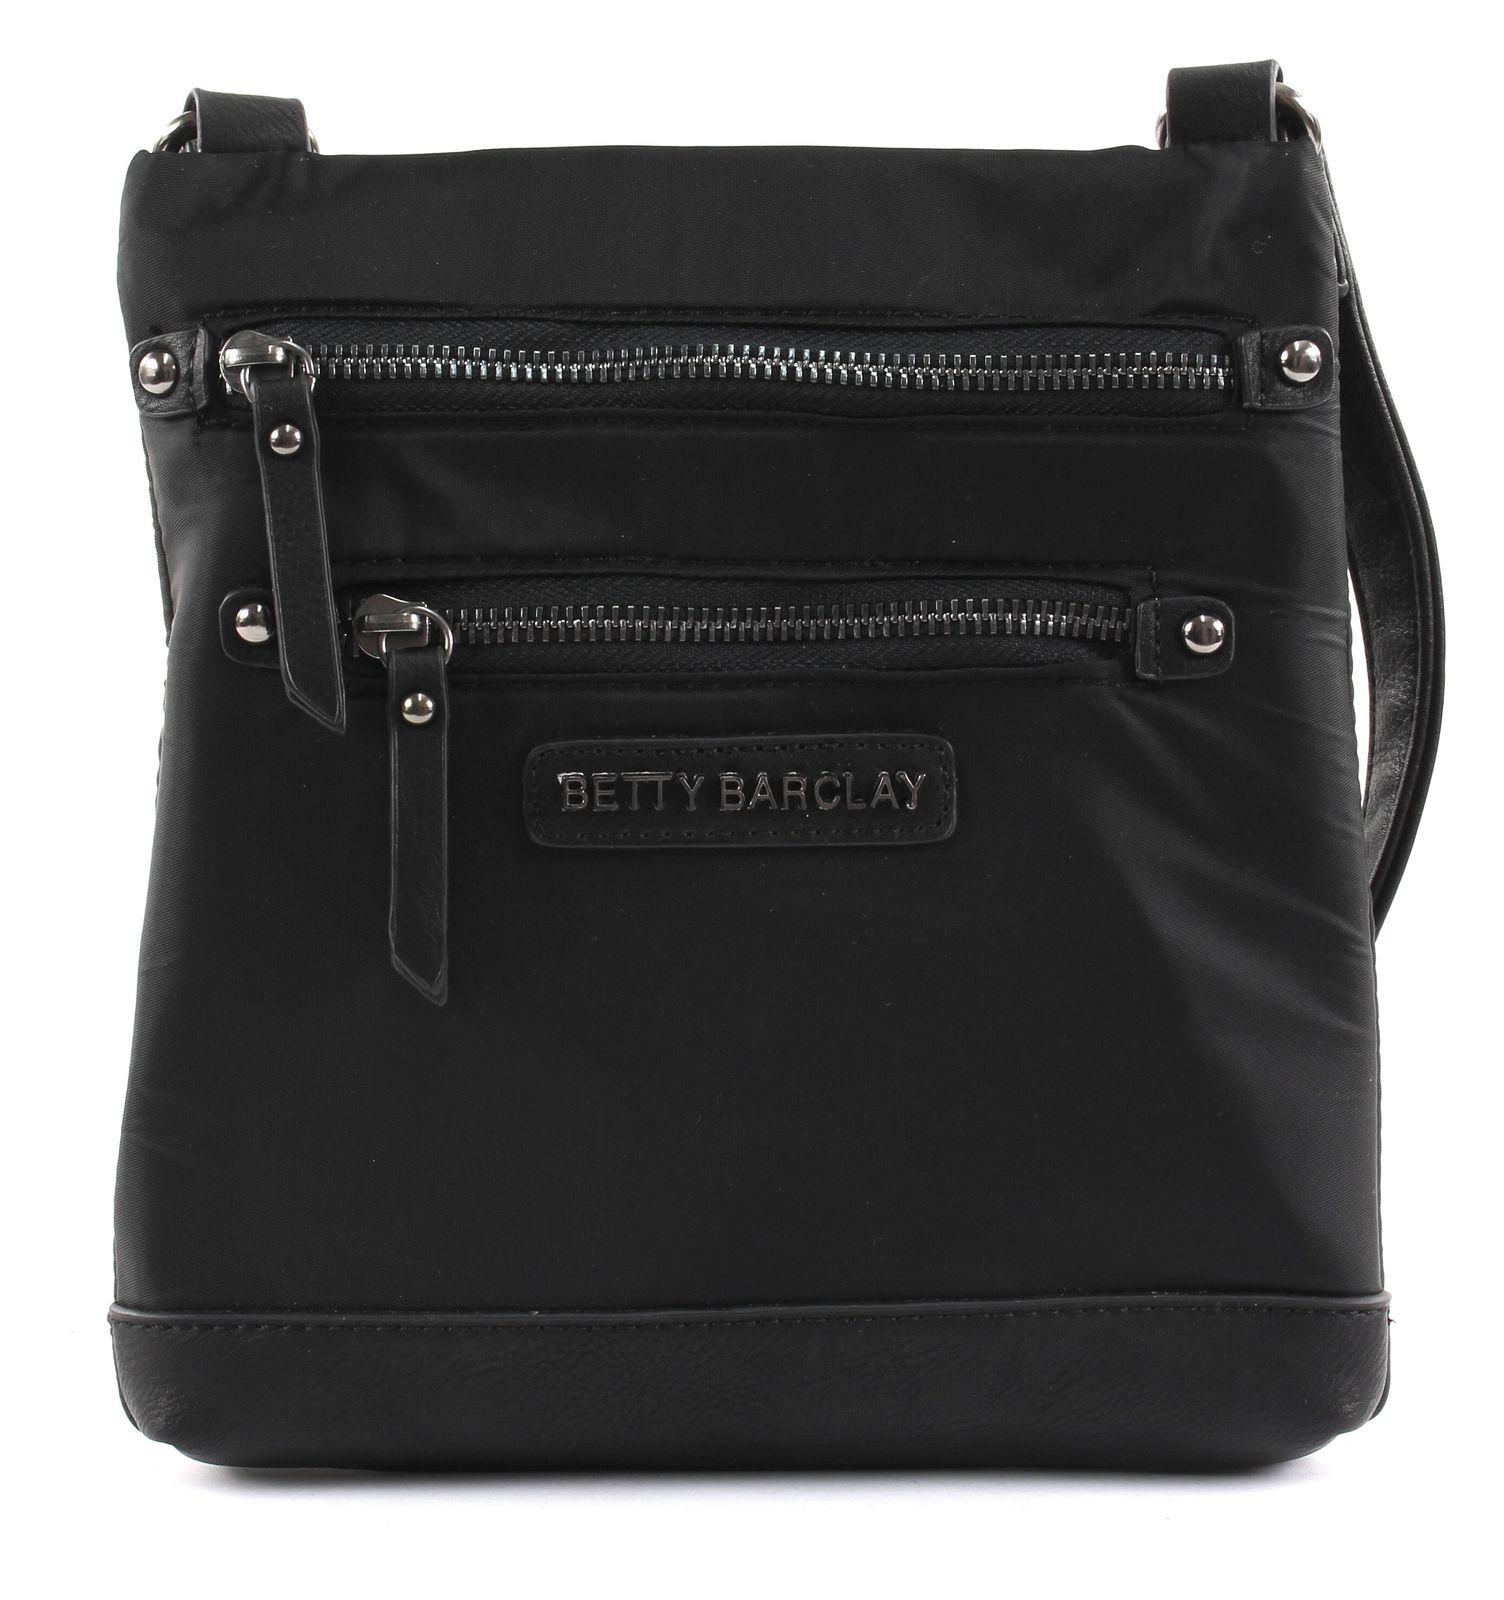 23733bf5a799e Betty Barclay Zip Bag Umhängetasche Tasche Black Schwarz Neu